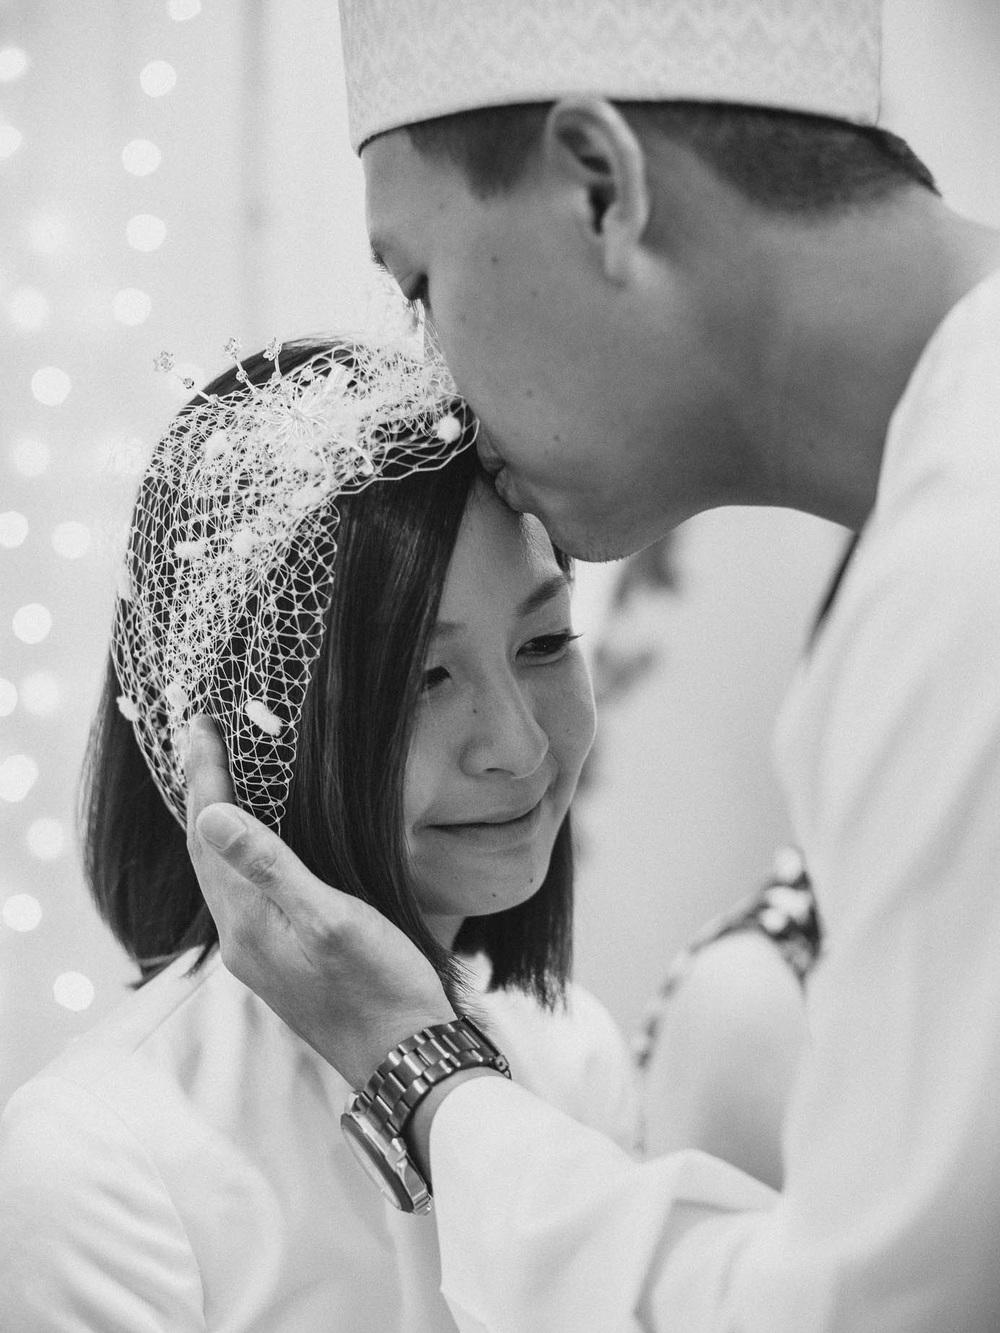 singapore-wedding-photographer-malay-indian-pre-wedding-travel-wmt-2015-alif-ethel-34.jpg